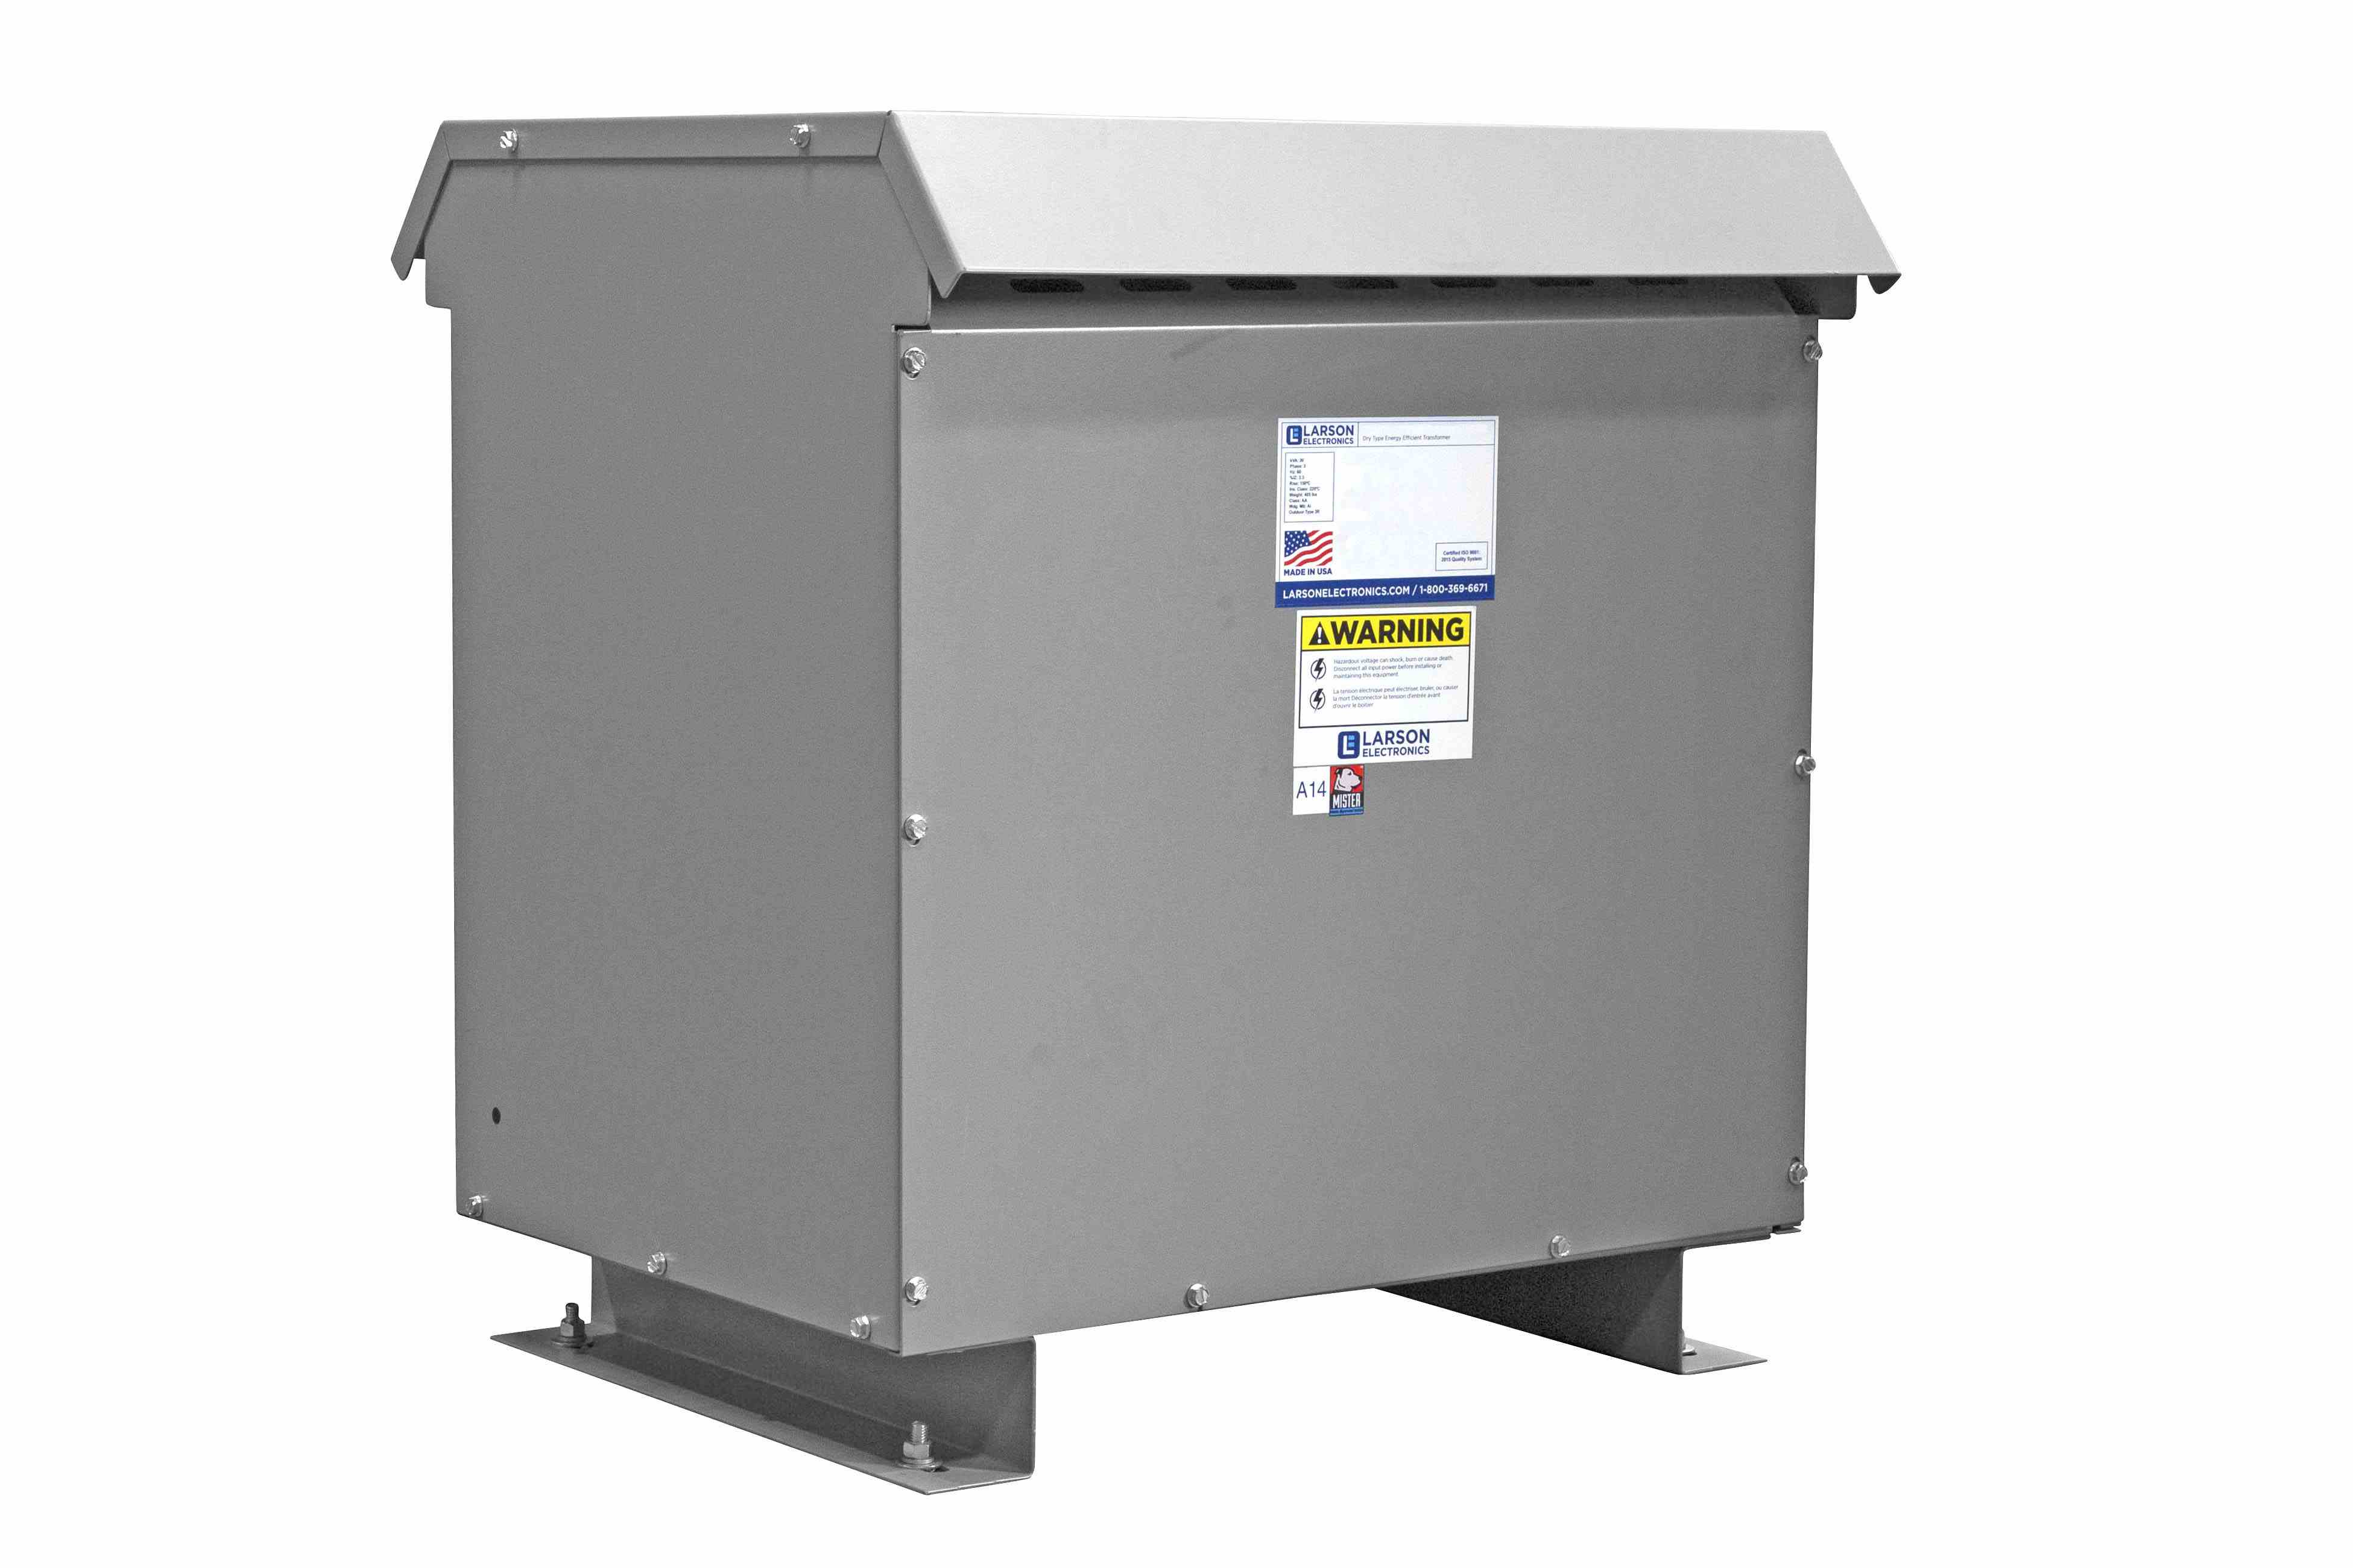 40 kVA 3PH Isolation Transformer, 480V Wye Primary, 240V/120 Delta Secondary, N3R, Ventilated, 60 Hz